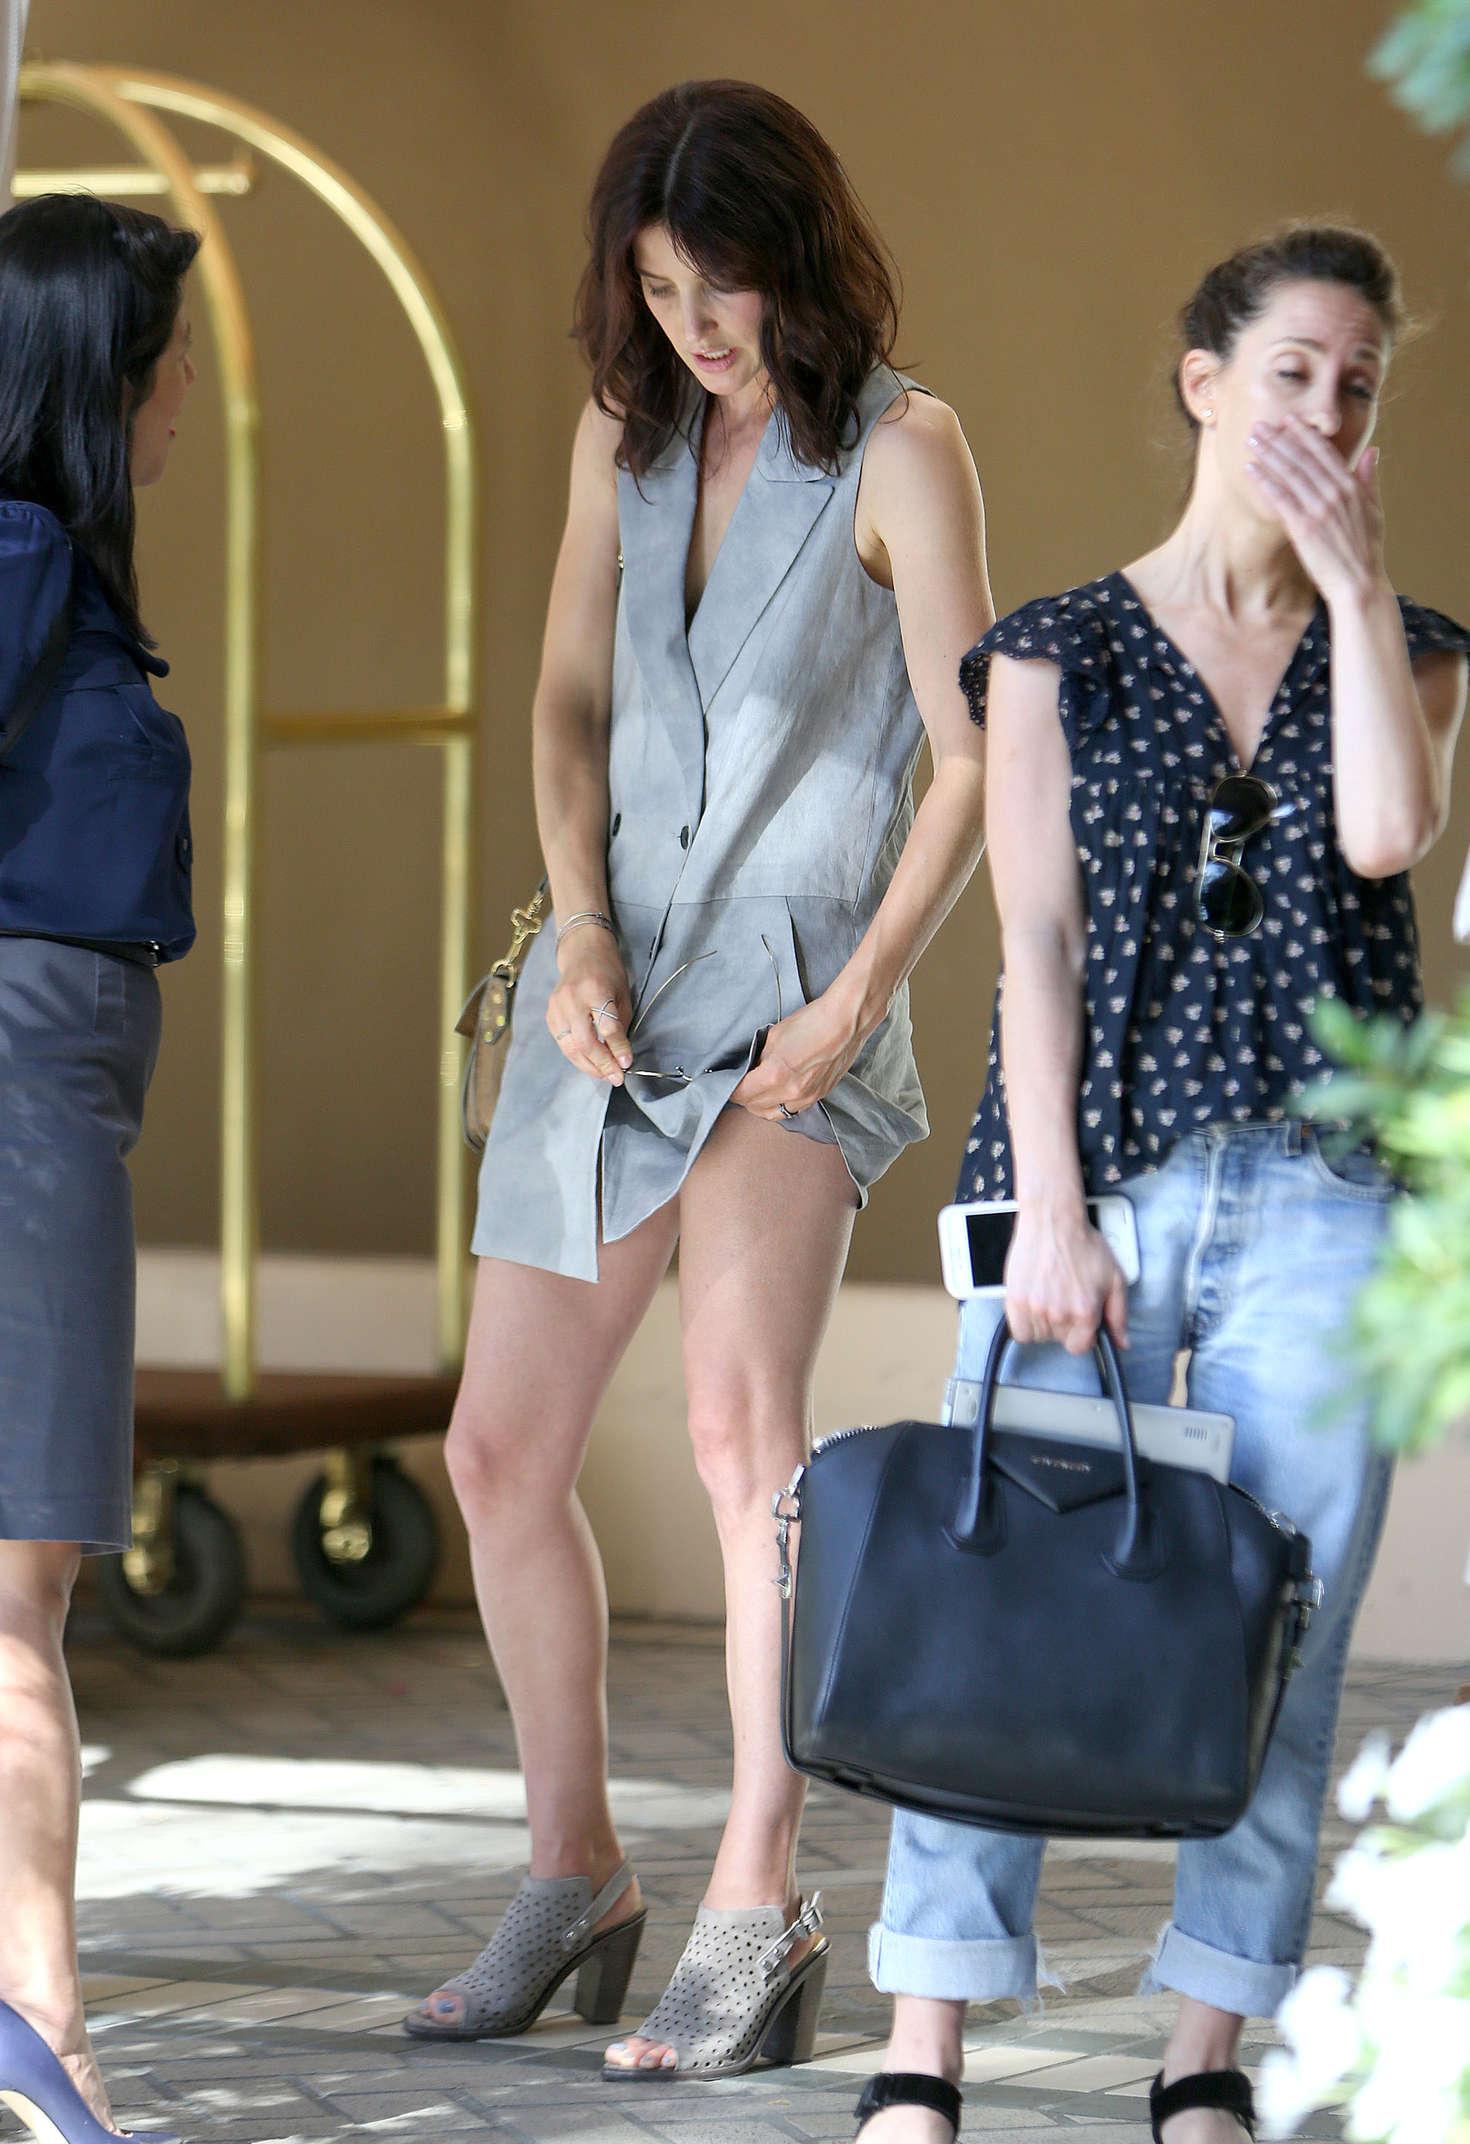 Bikini Cobie Smulders naked (47 photos), Topless, Bikini, Boobs, bra 2015